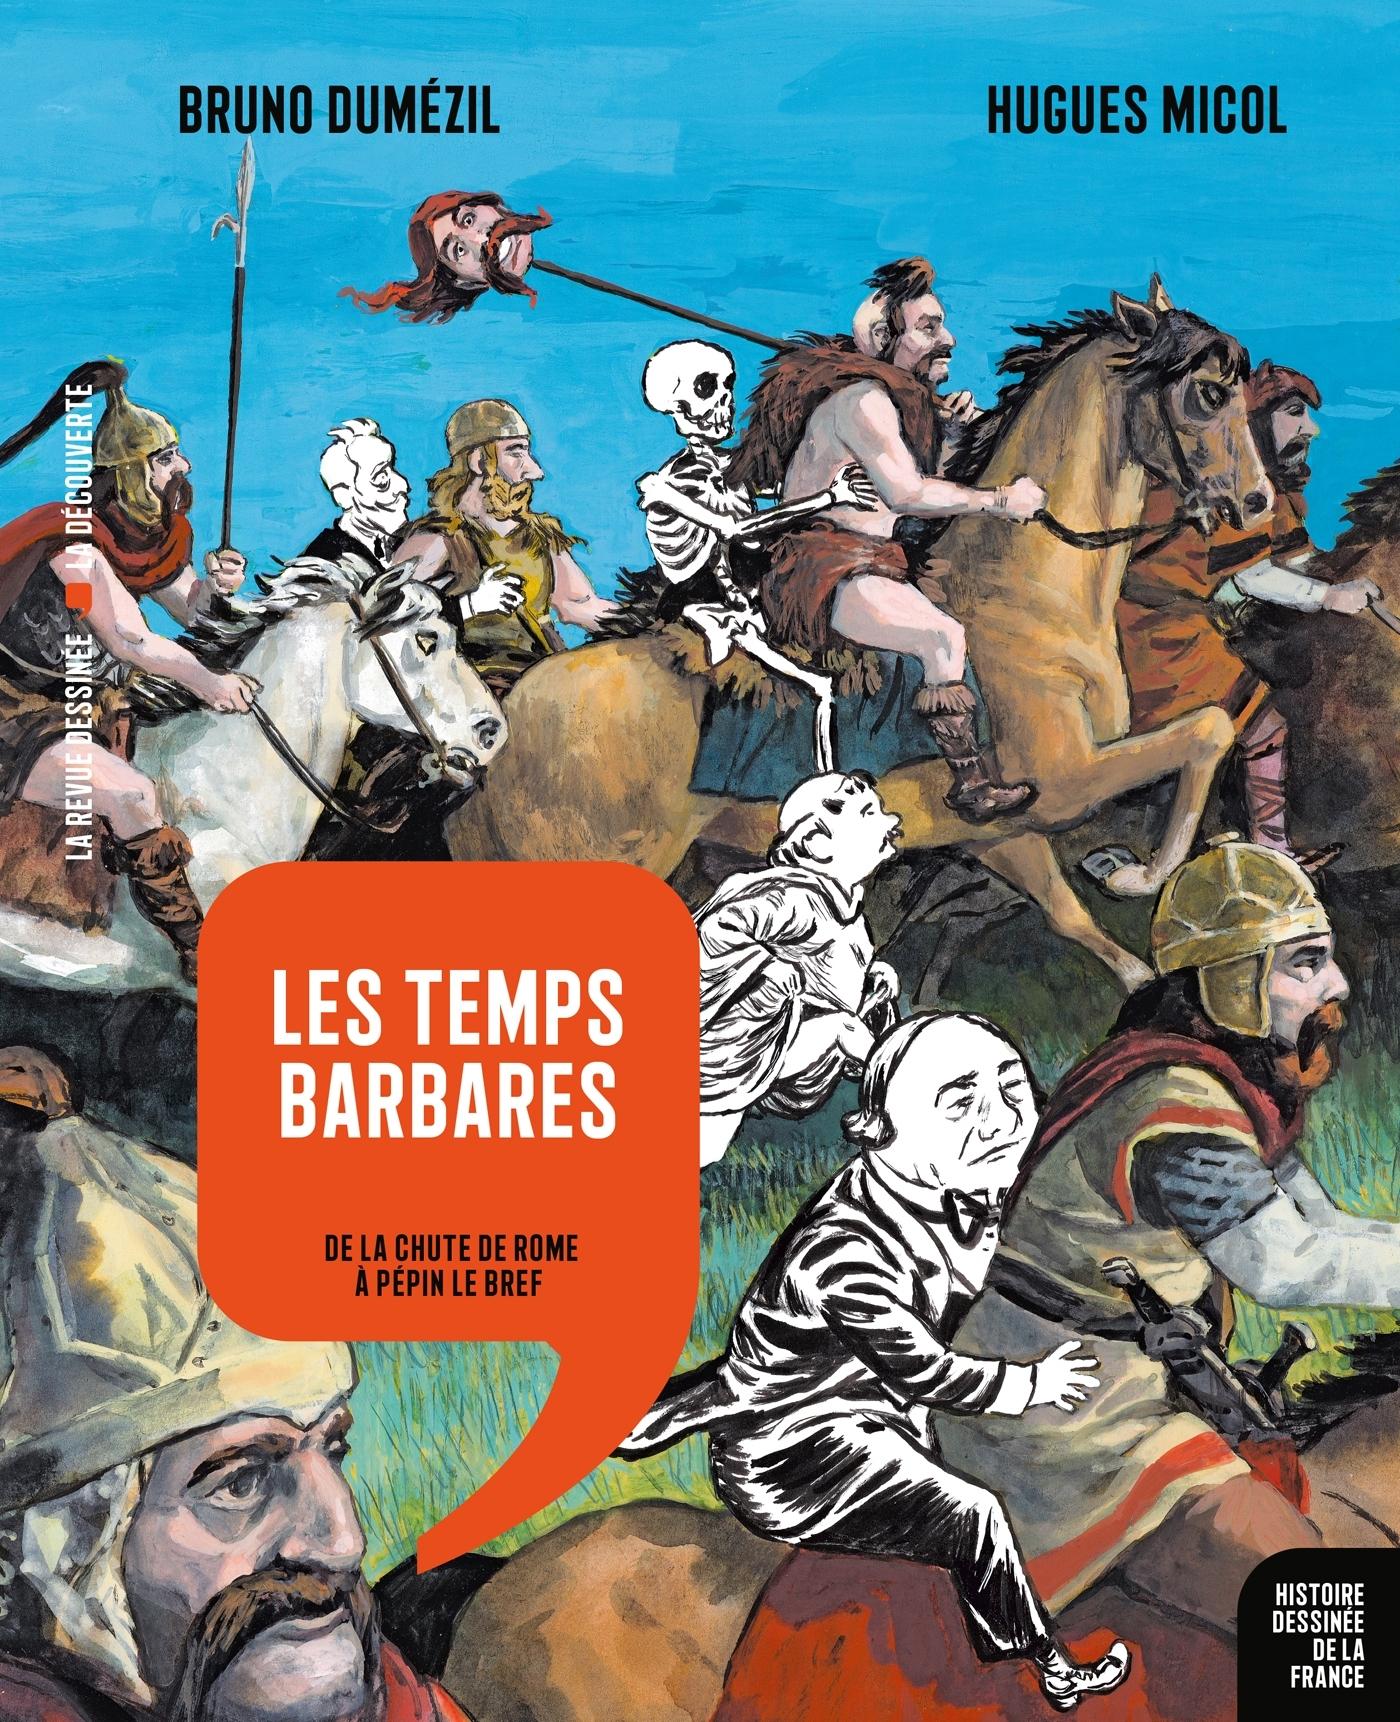 HISTOIRE DESSINEE DE LA FRANCE - 4 - LES TEMPS BARBARES - DE LA CHUTE DE ROME A PEPIN LE BREF